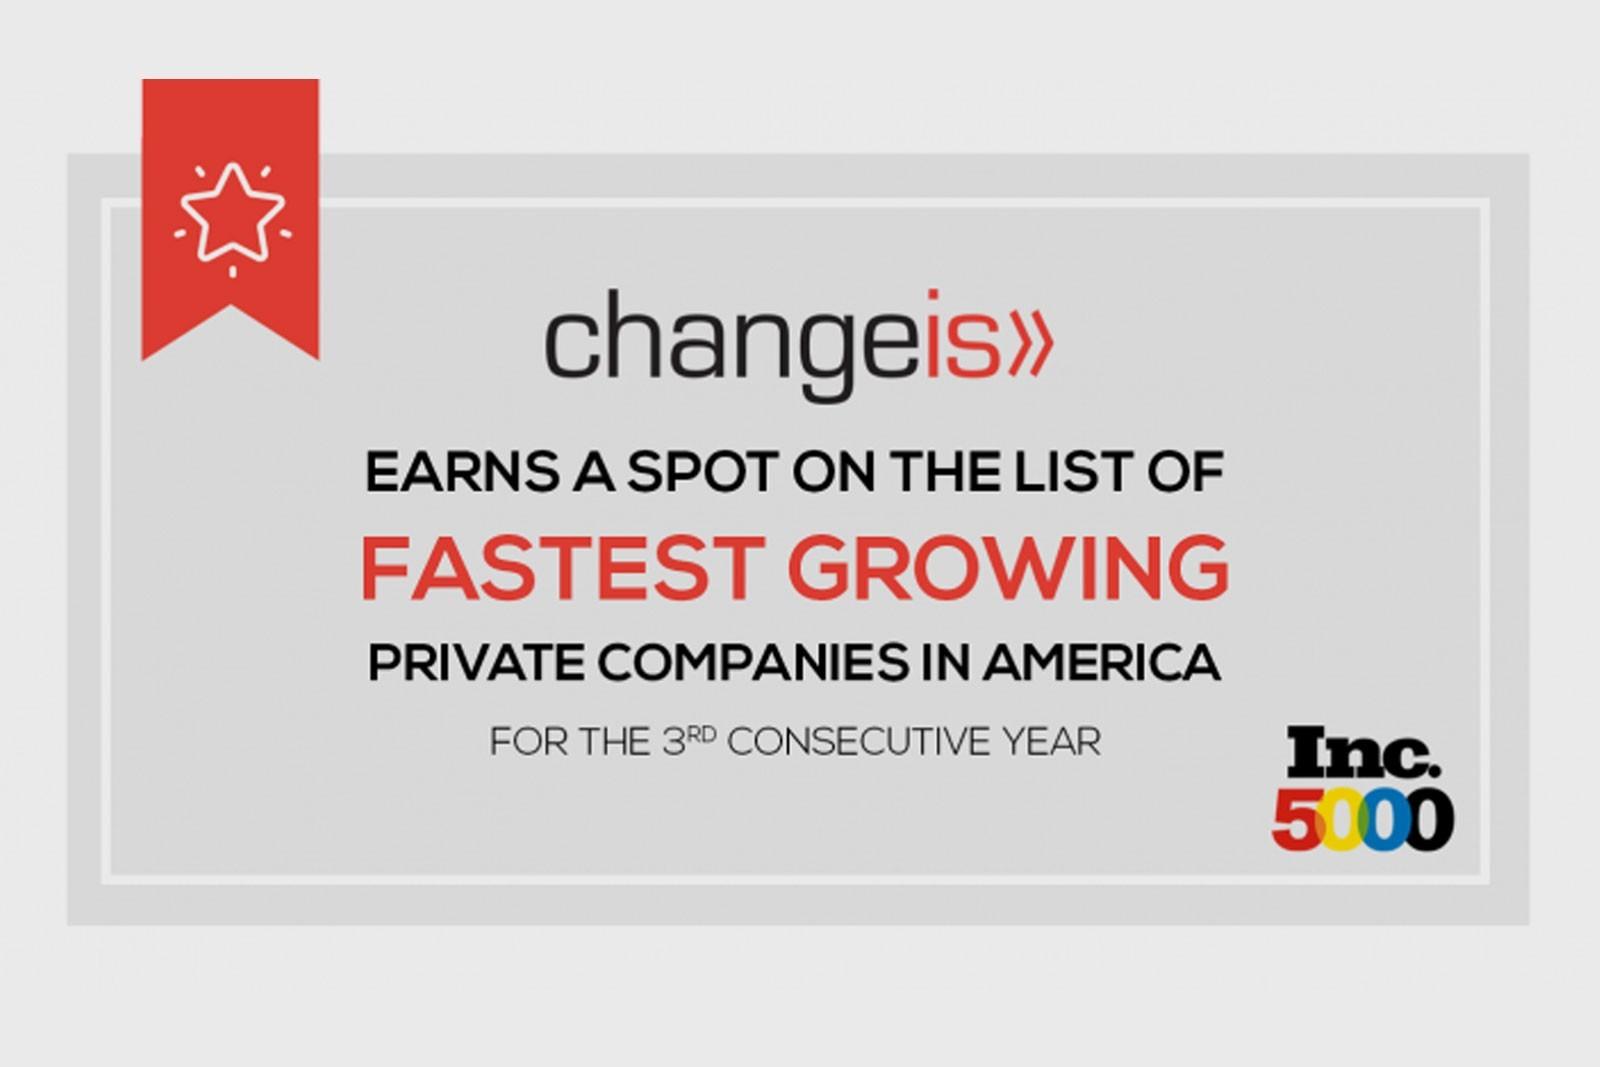 Changeis Awarded Prestigious Place on Inc. 5000 List for Third Consecutive Year